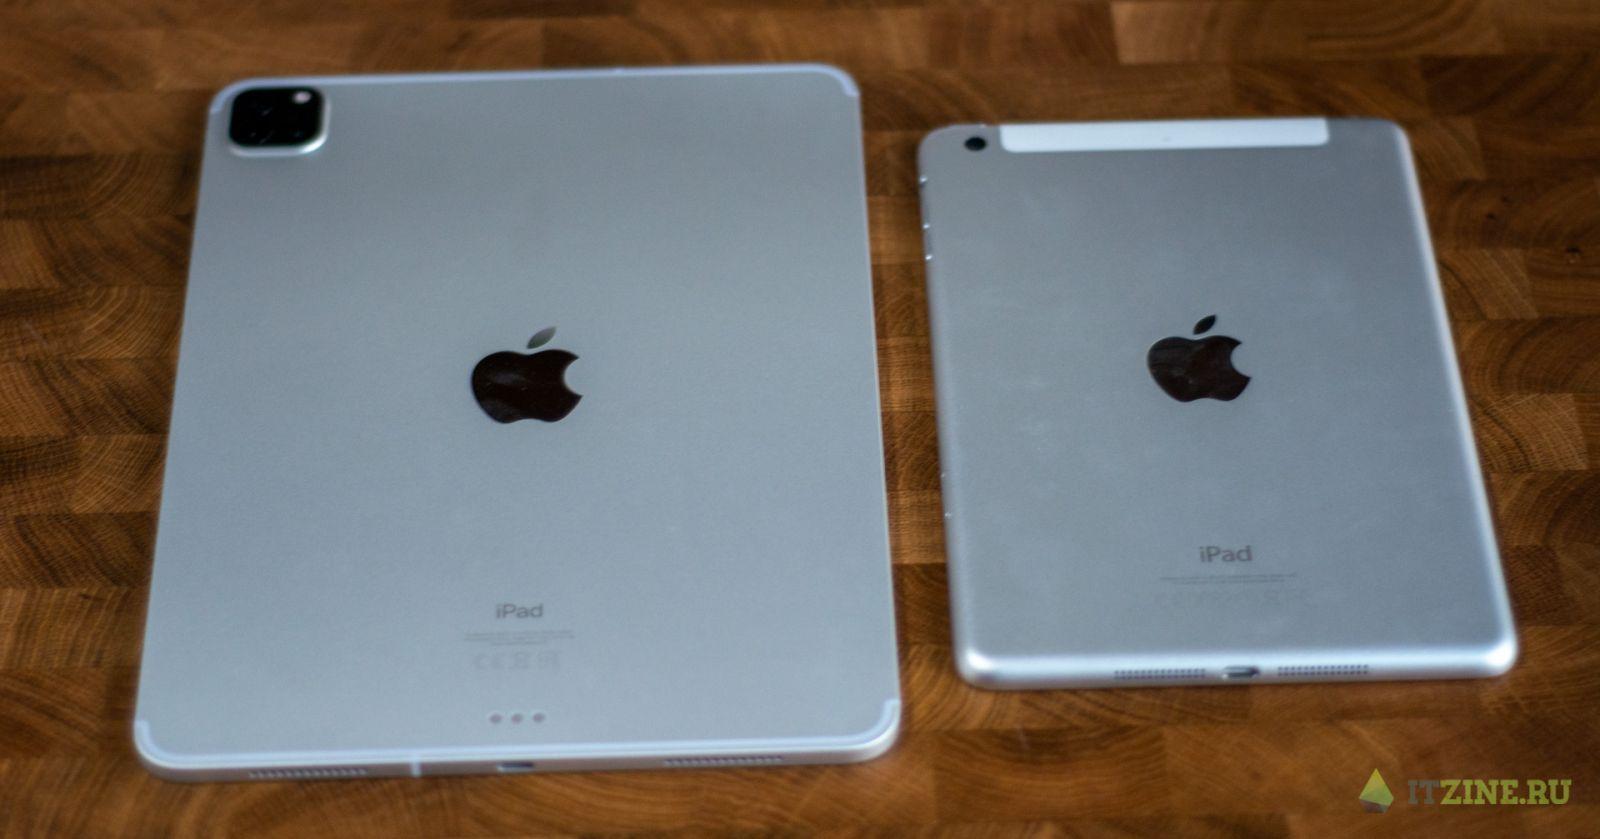 Дизайнерский рай. Обзор Apple iPad Pro 2020 + Apple Pencil + Magic Keyboard (dsc 8900)